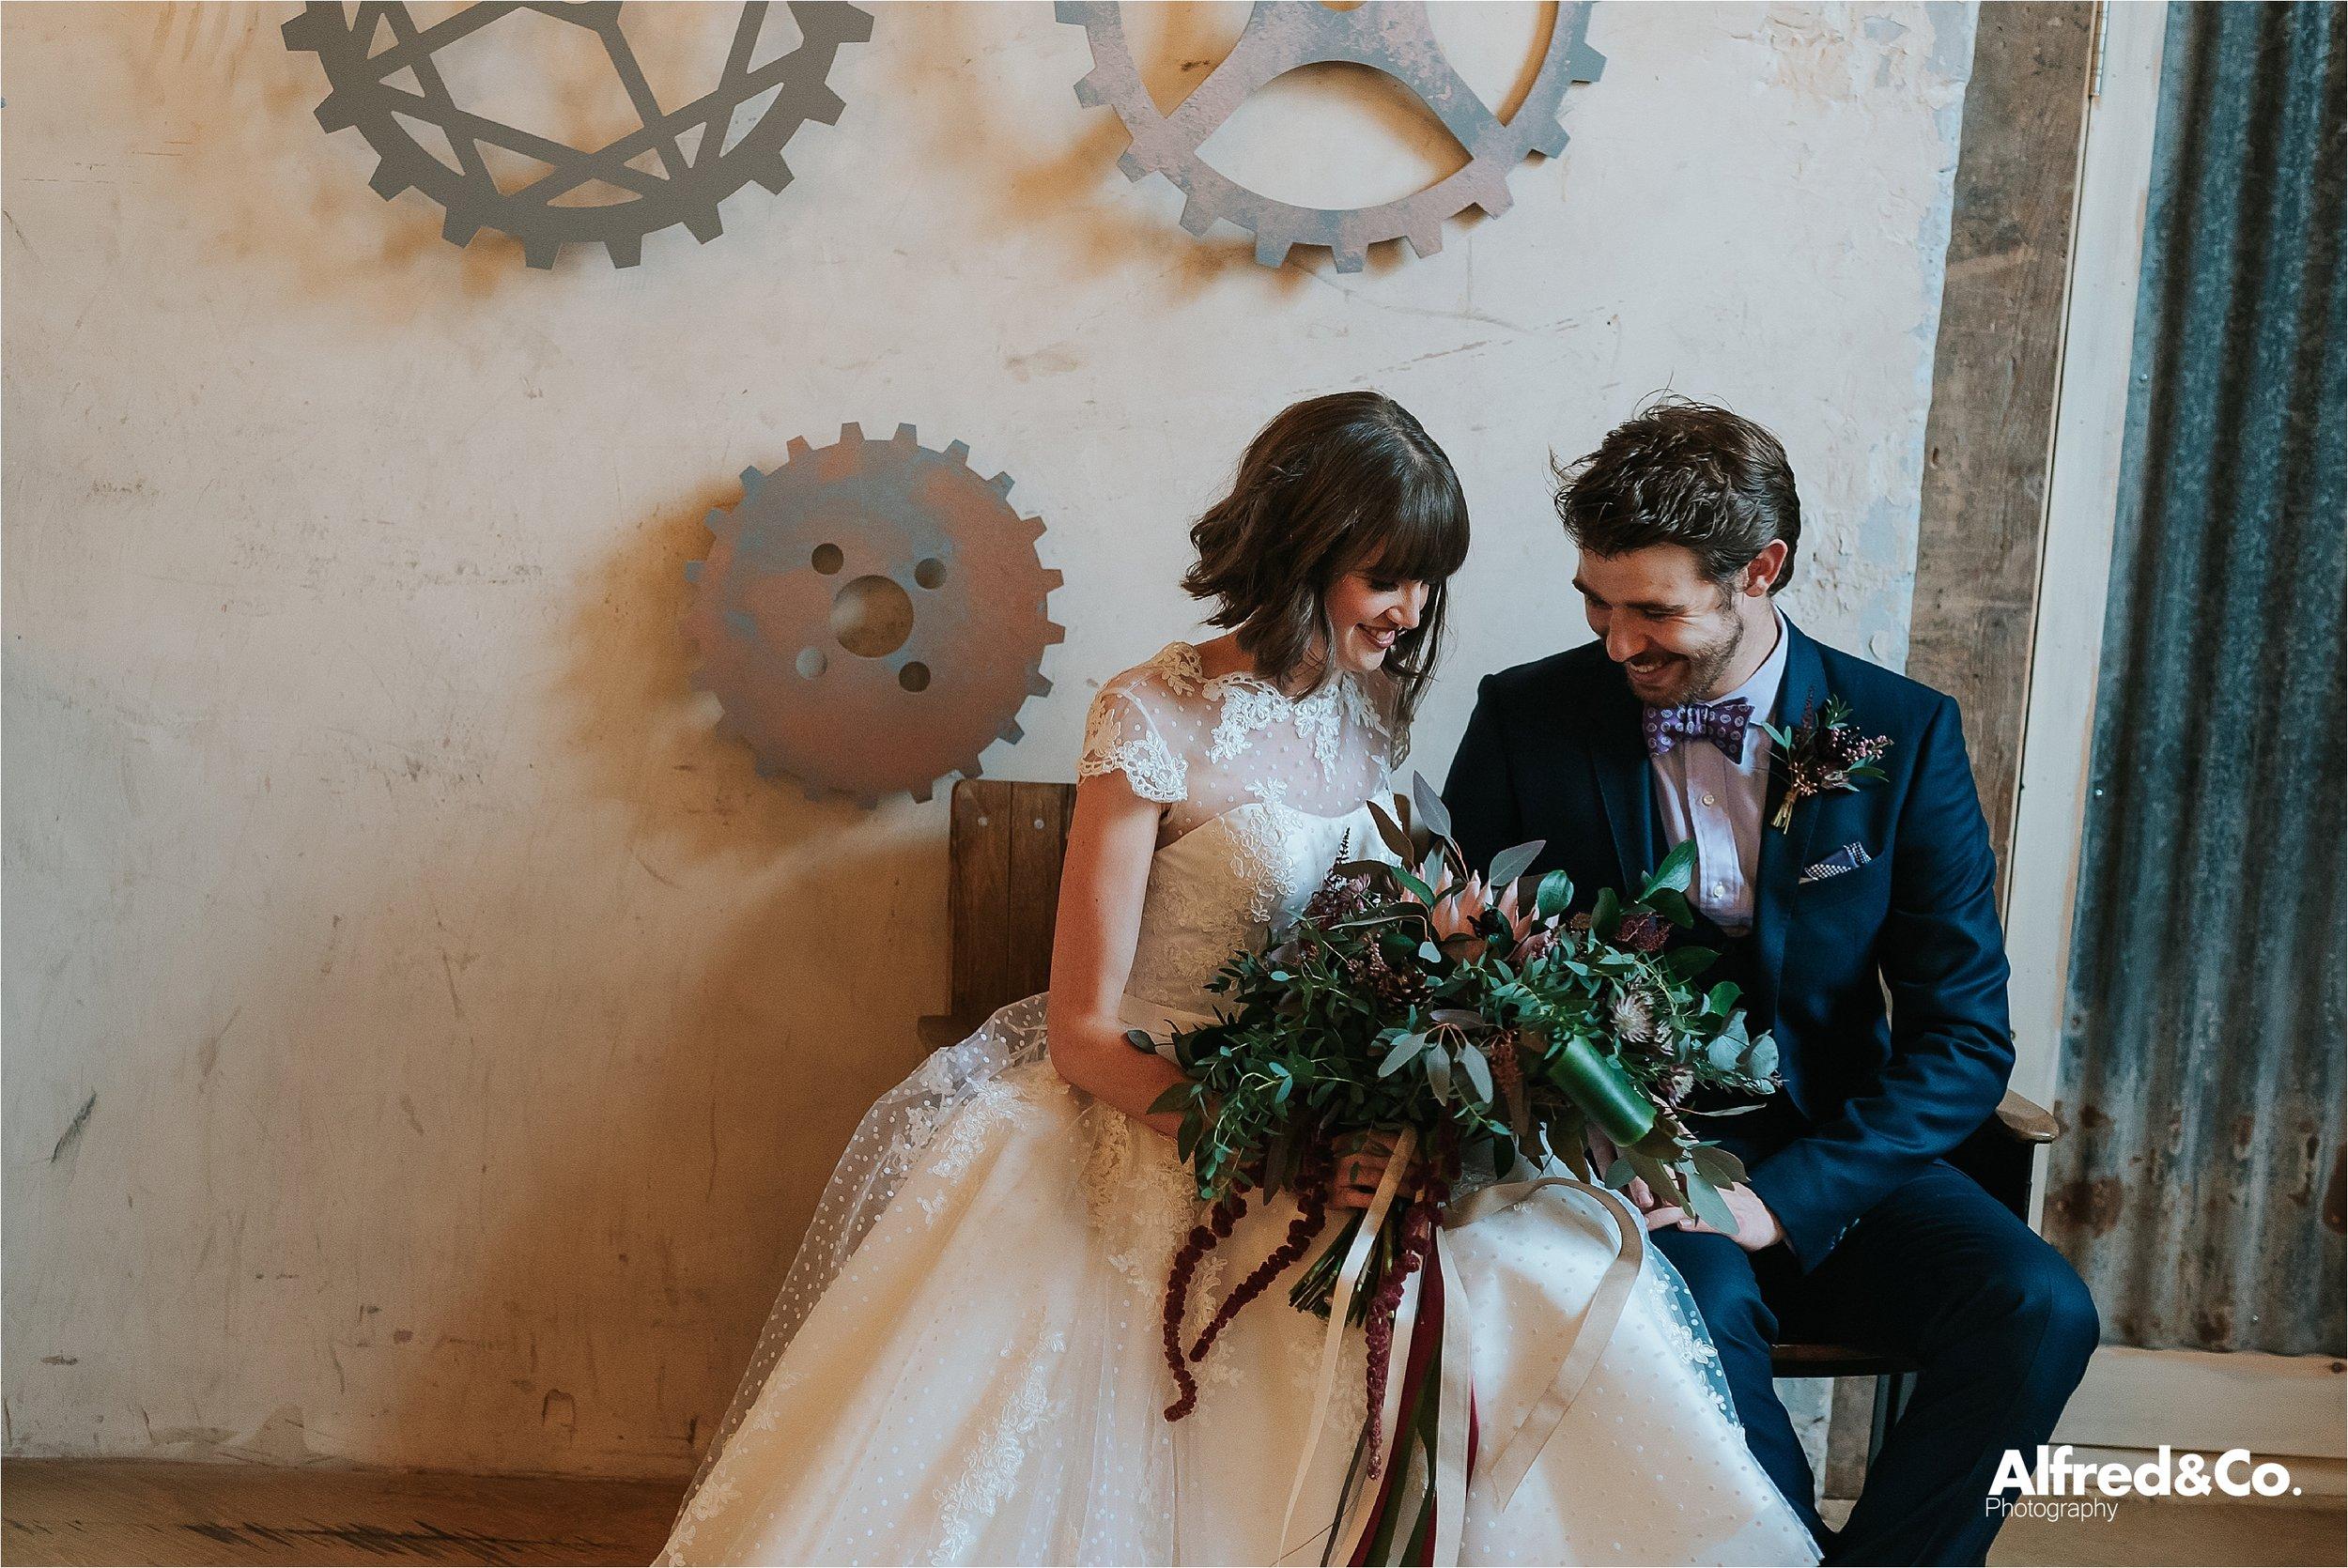 holmesmill+wedding+clitheroe+photographer+rustic+lancashire26.jpg